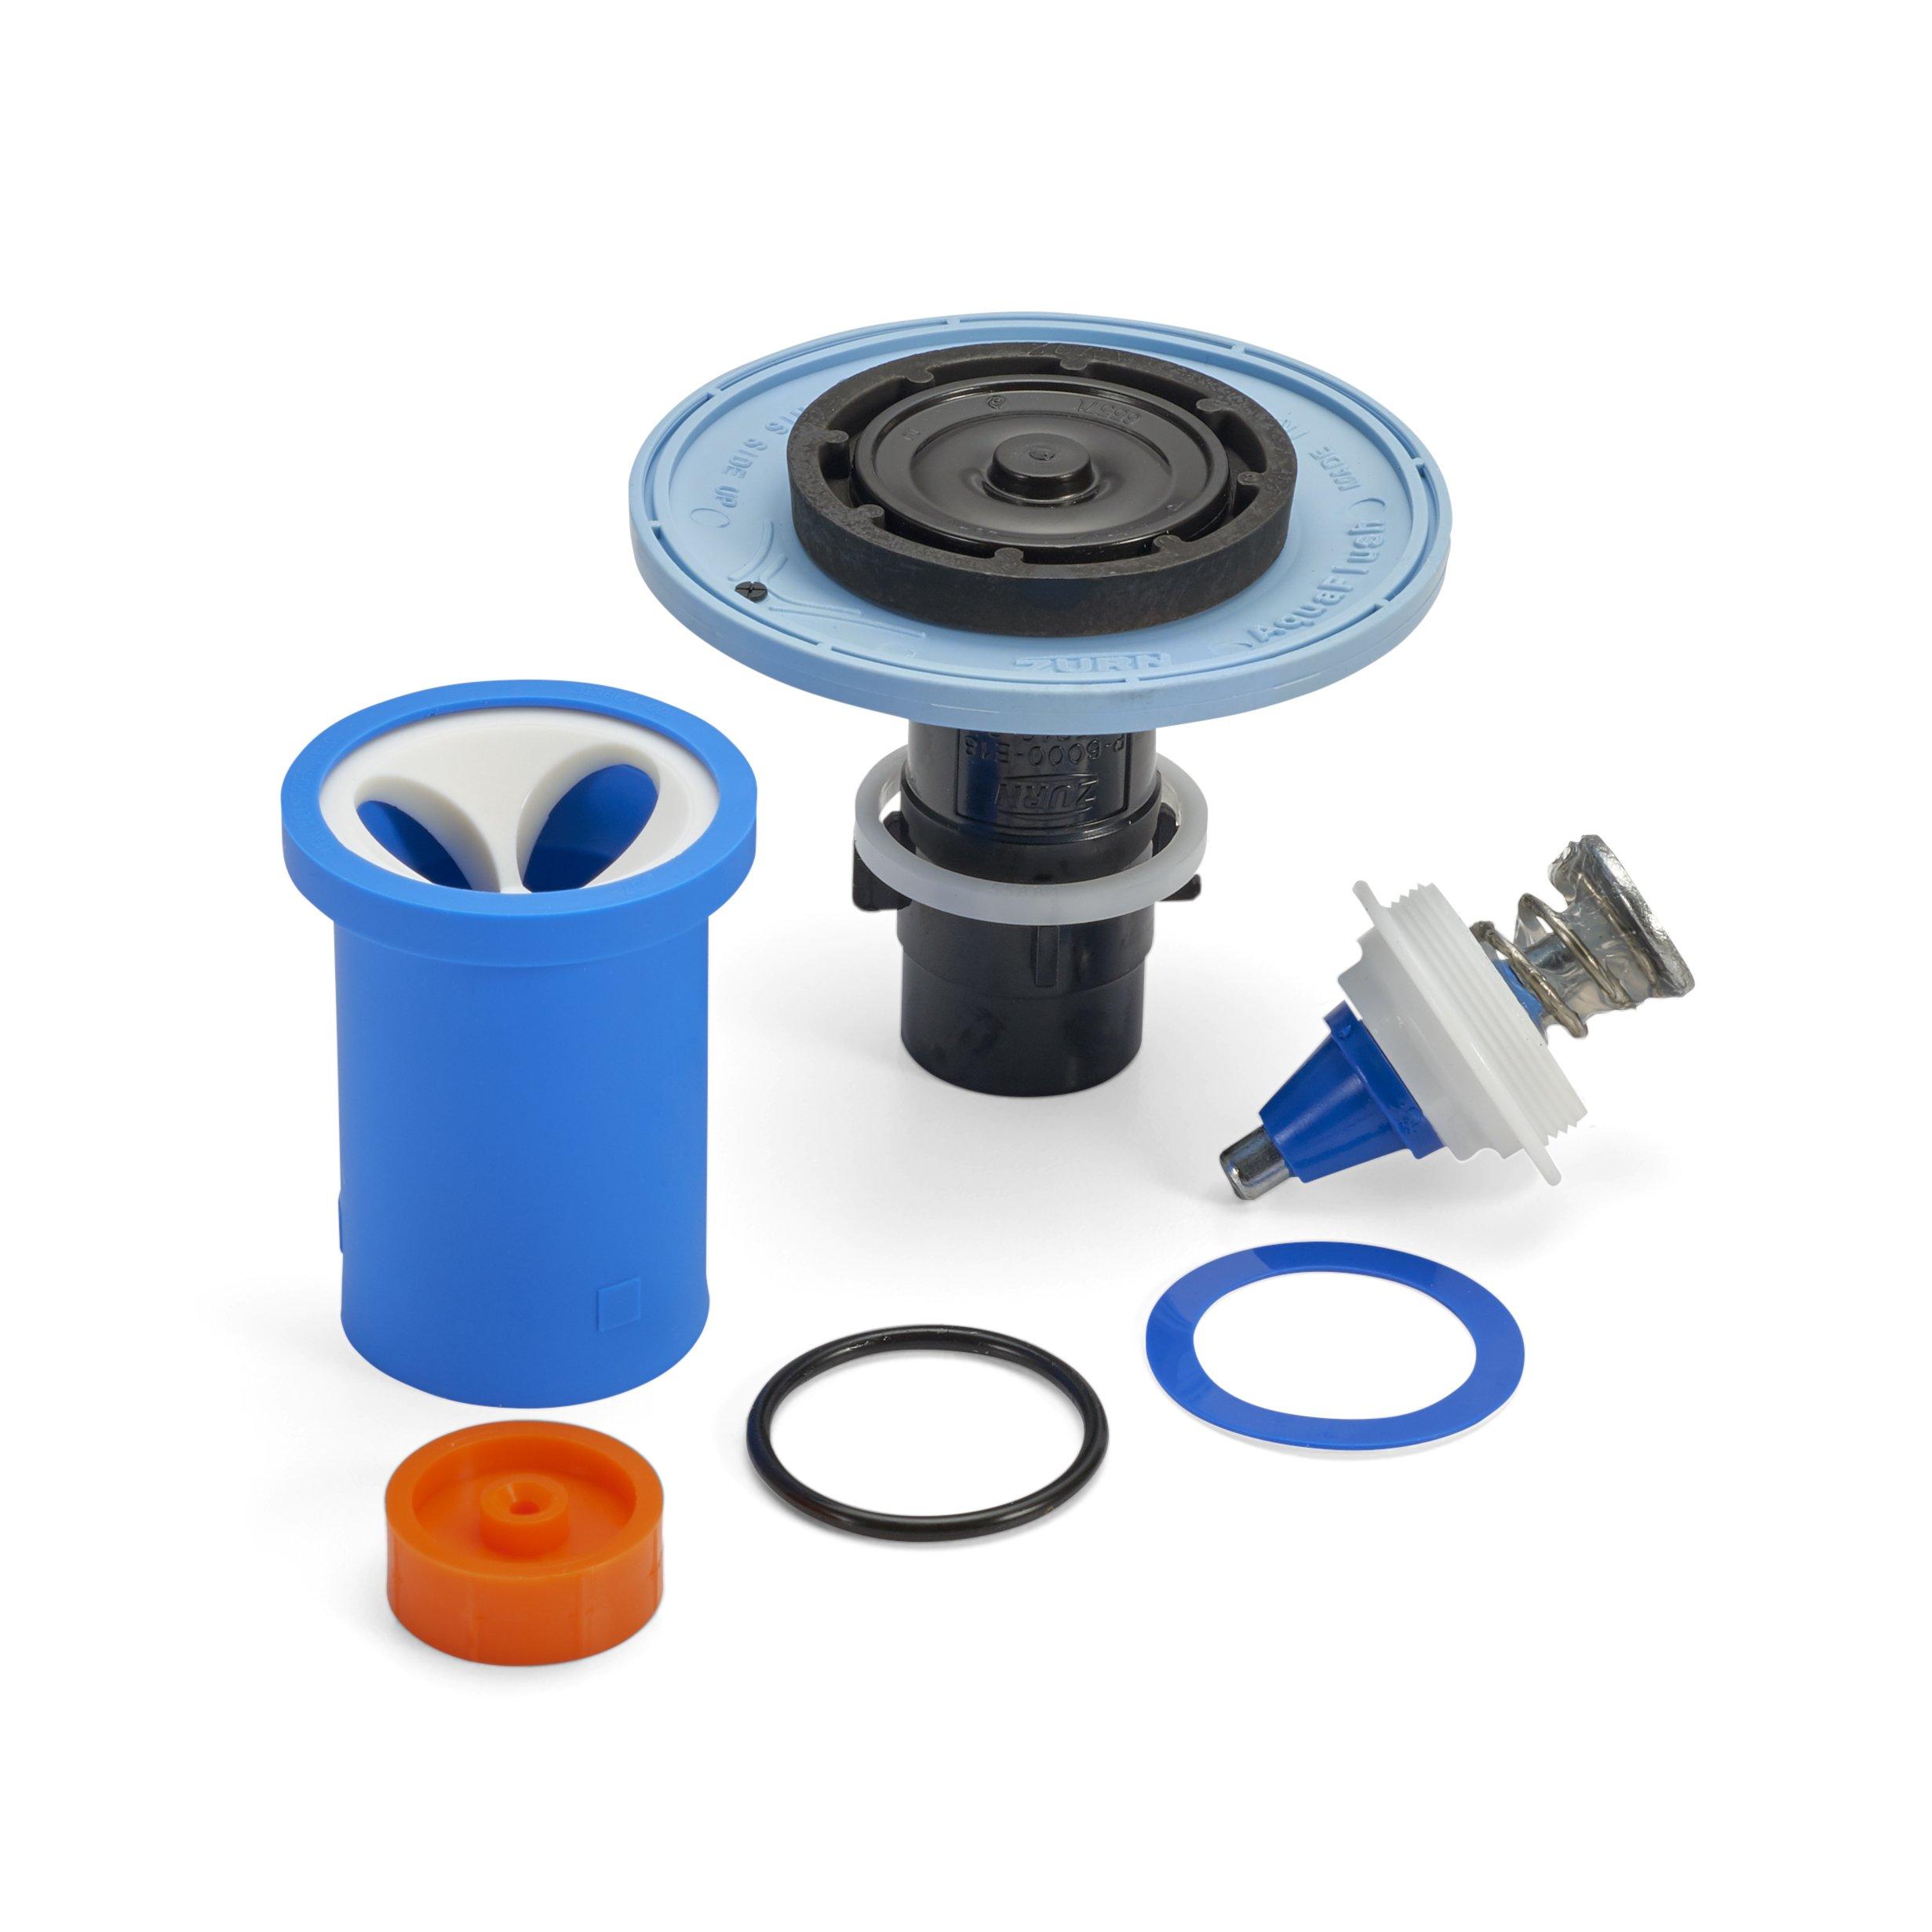 Zurn AquaVantage Urinal Rebuild Kit, P6000-EUA-ULF-RK, .125 gpf, Diaphragm Rebuild Kit by Zurn